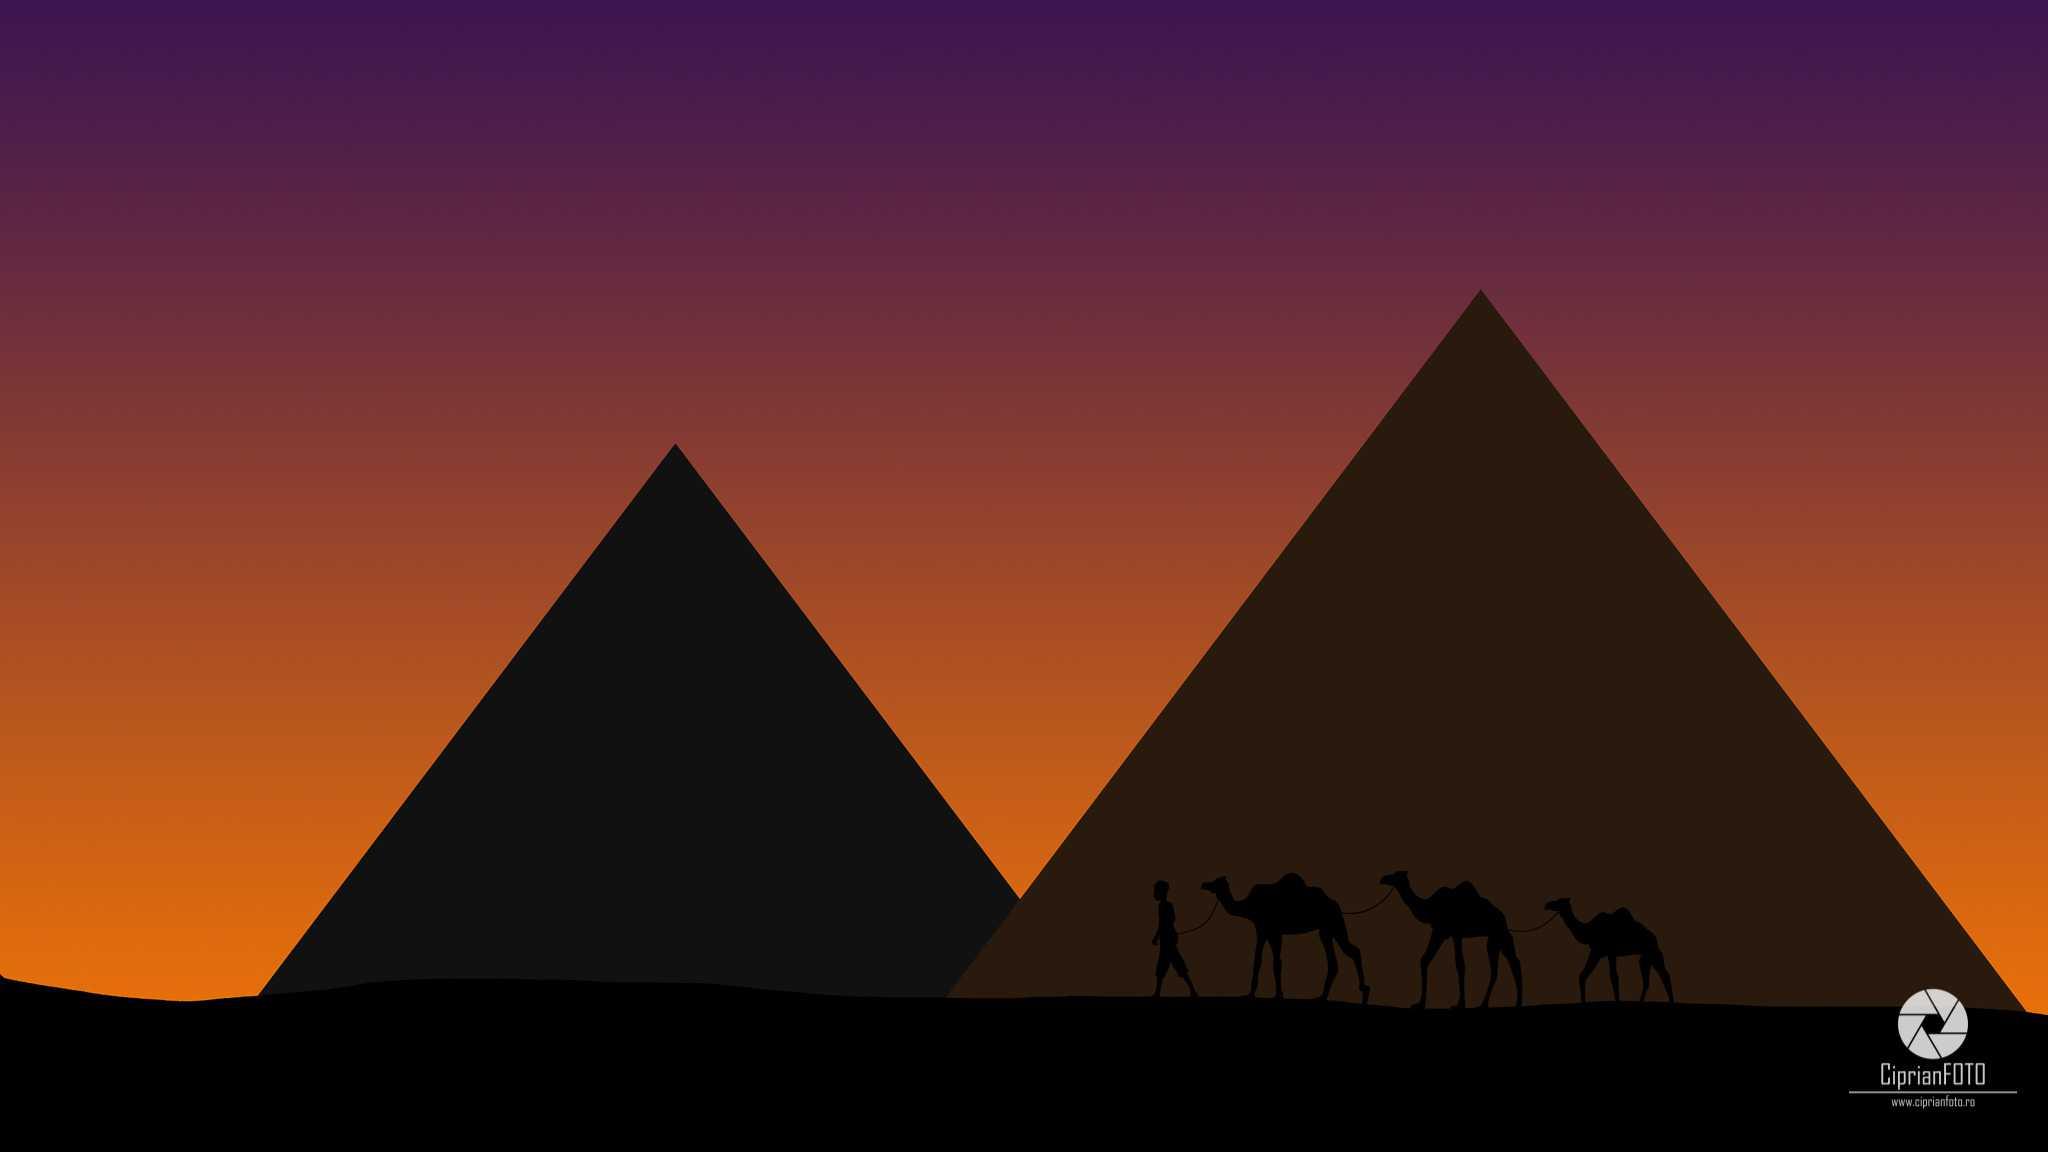 Camel_Caravan_Photoshop_Manipulation_Tutorial_CiprianFOTO